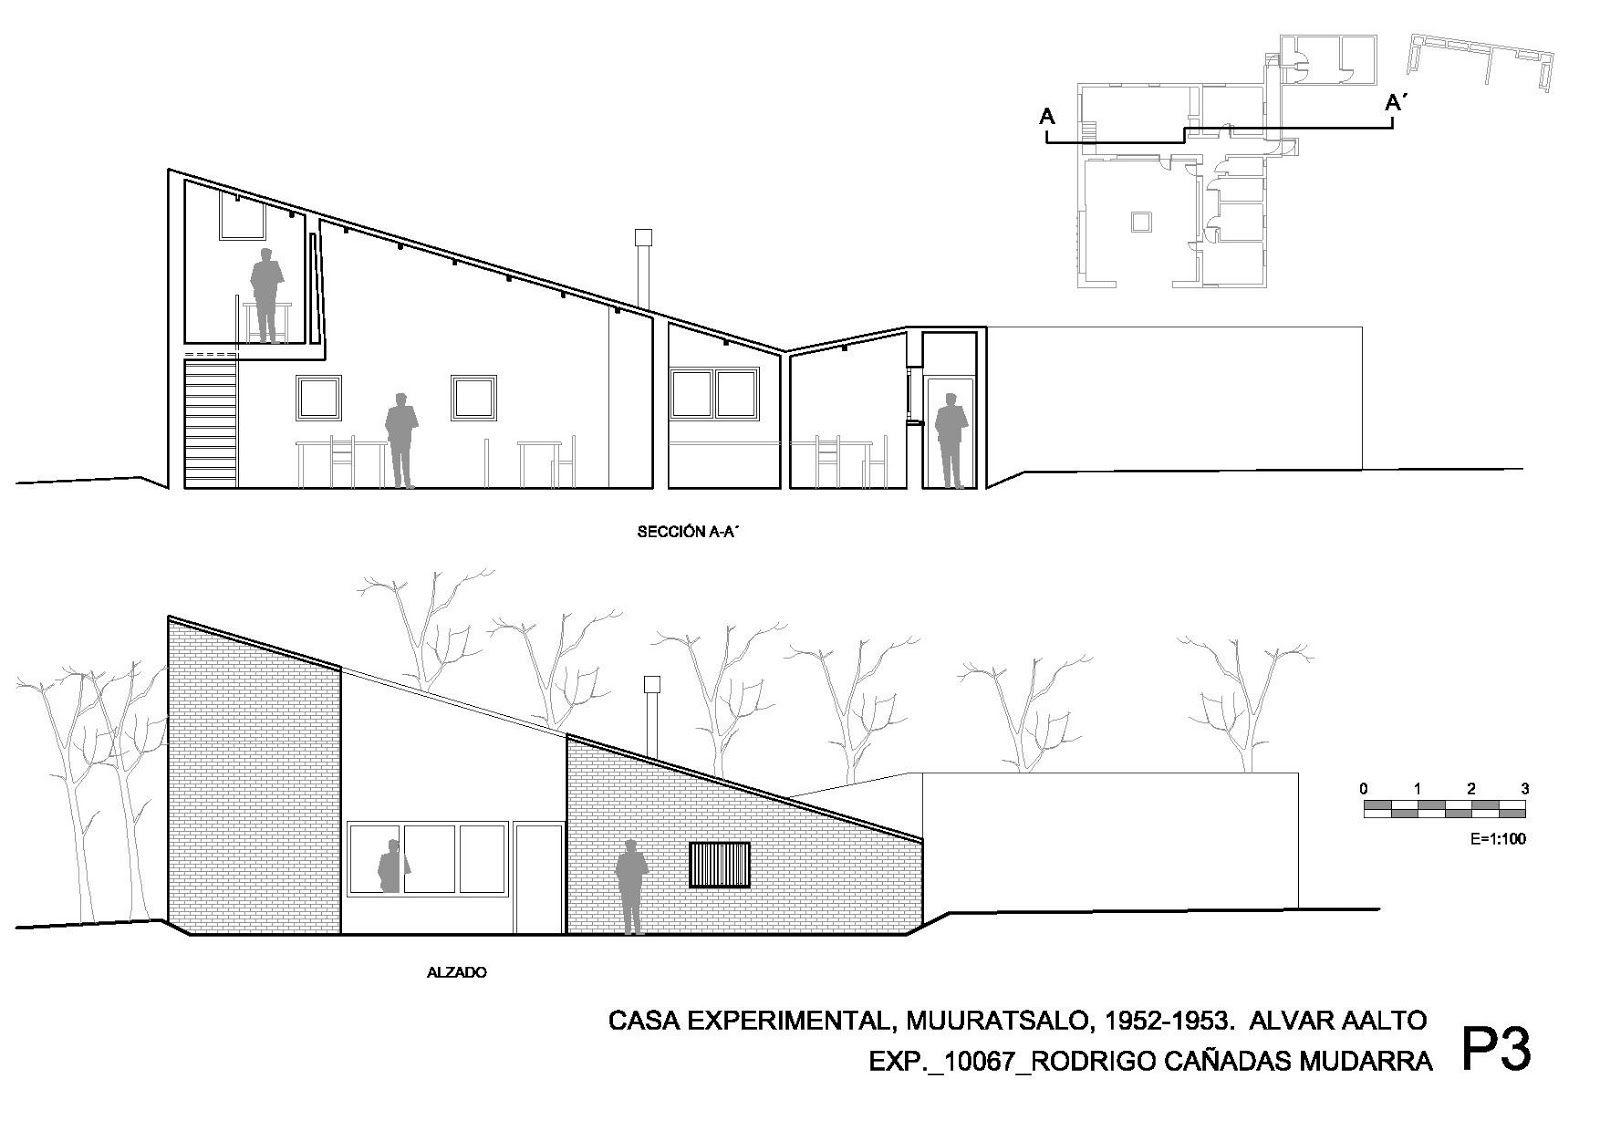 Alvar Aalto Experimental House Plans Interior